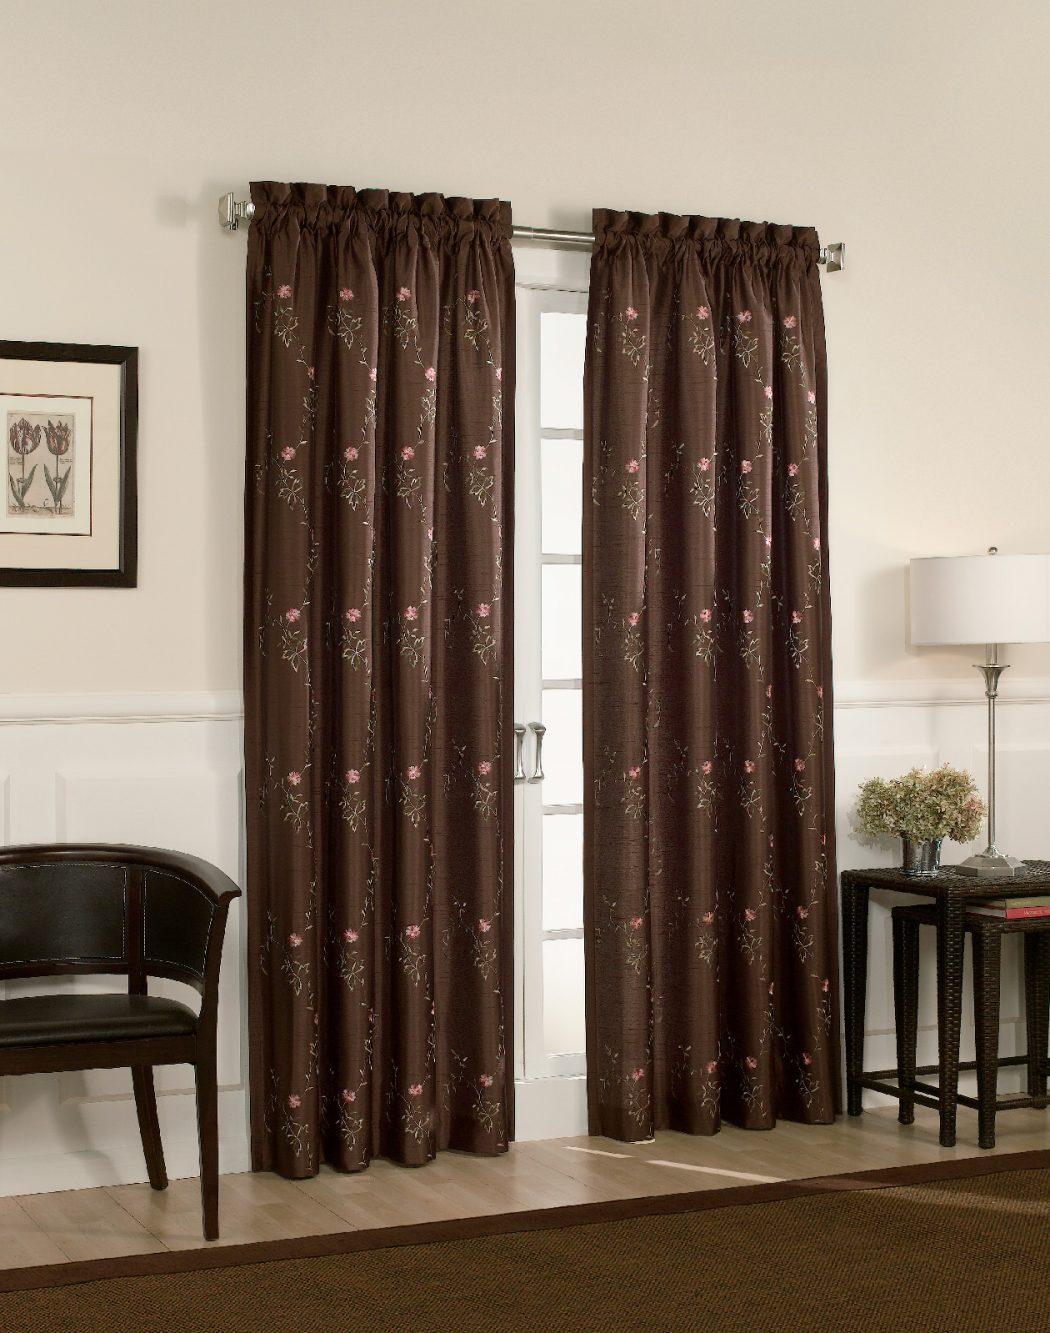 Hottest Curtain Design 2018